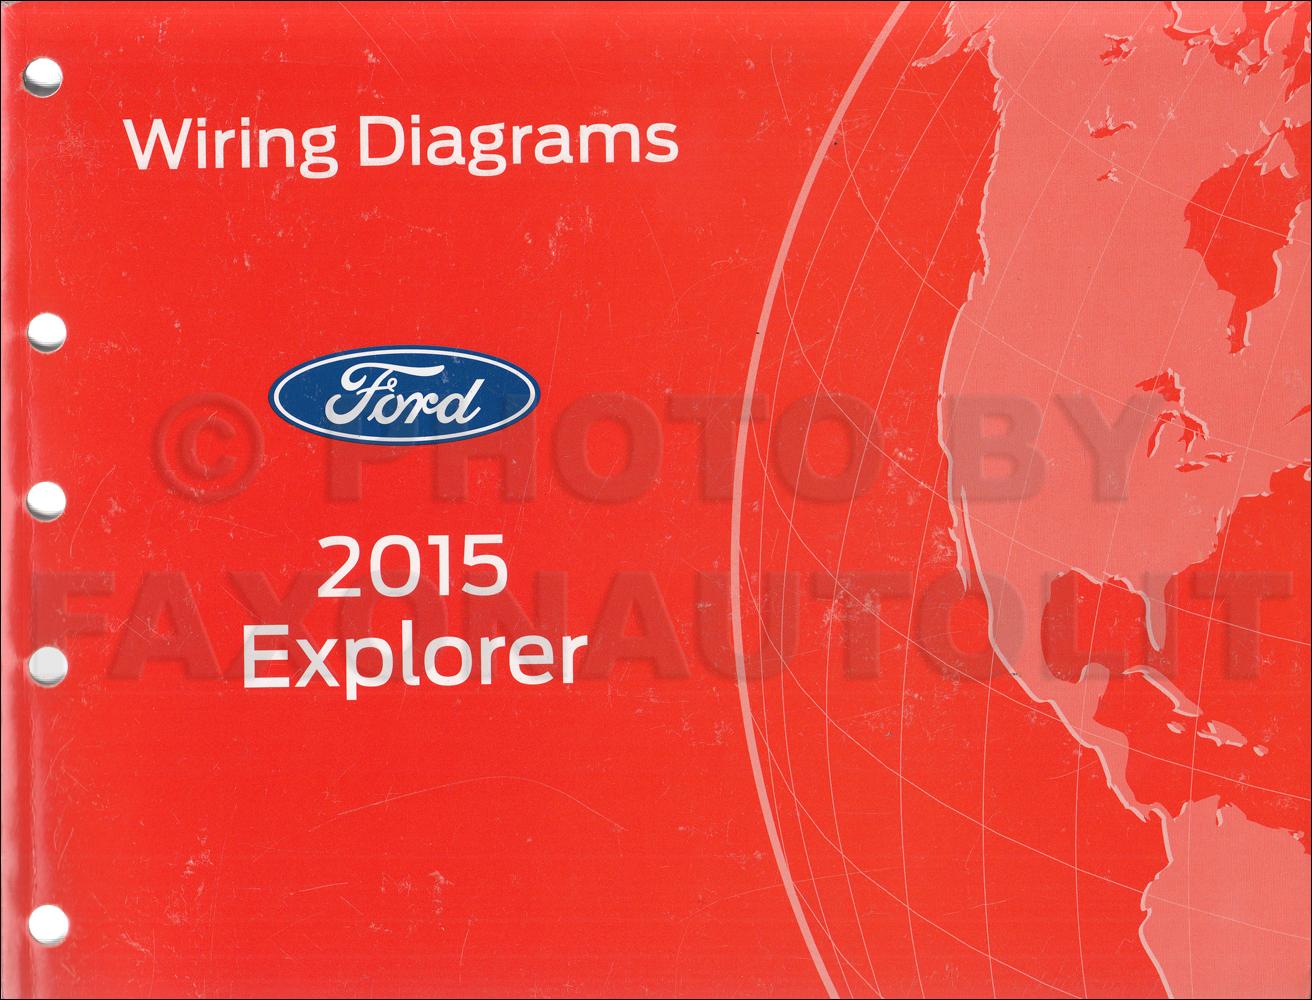 2016 ford explorer wiring diagram drayton rts1 room thermostat 2015 33